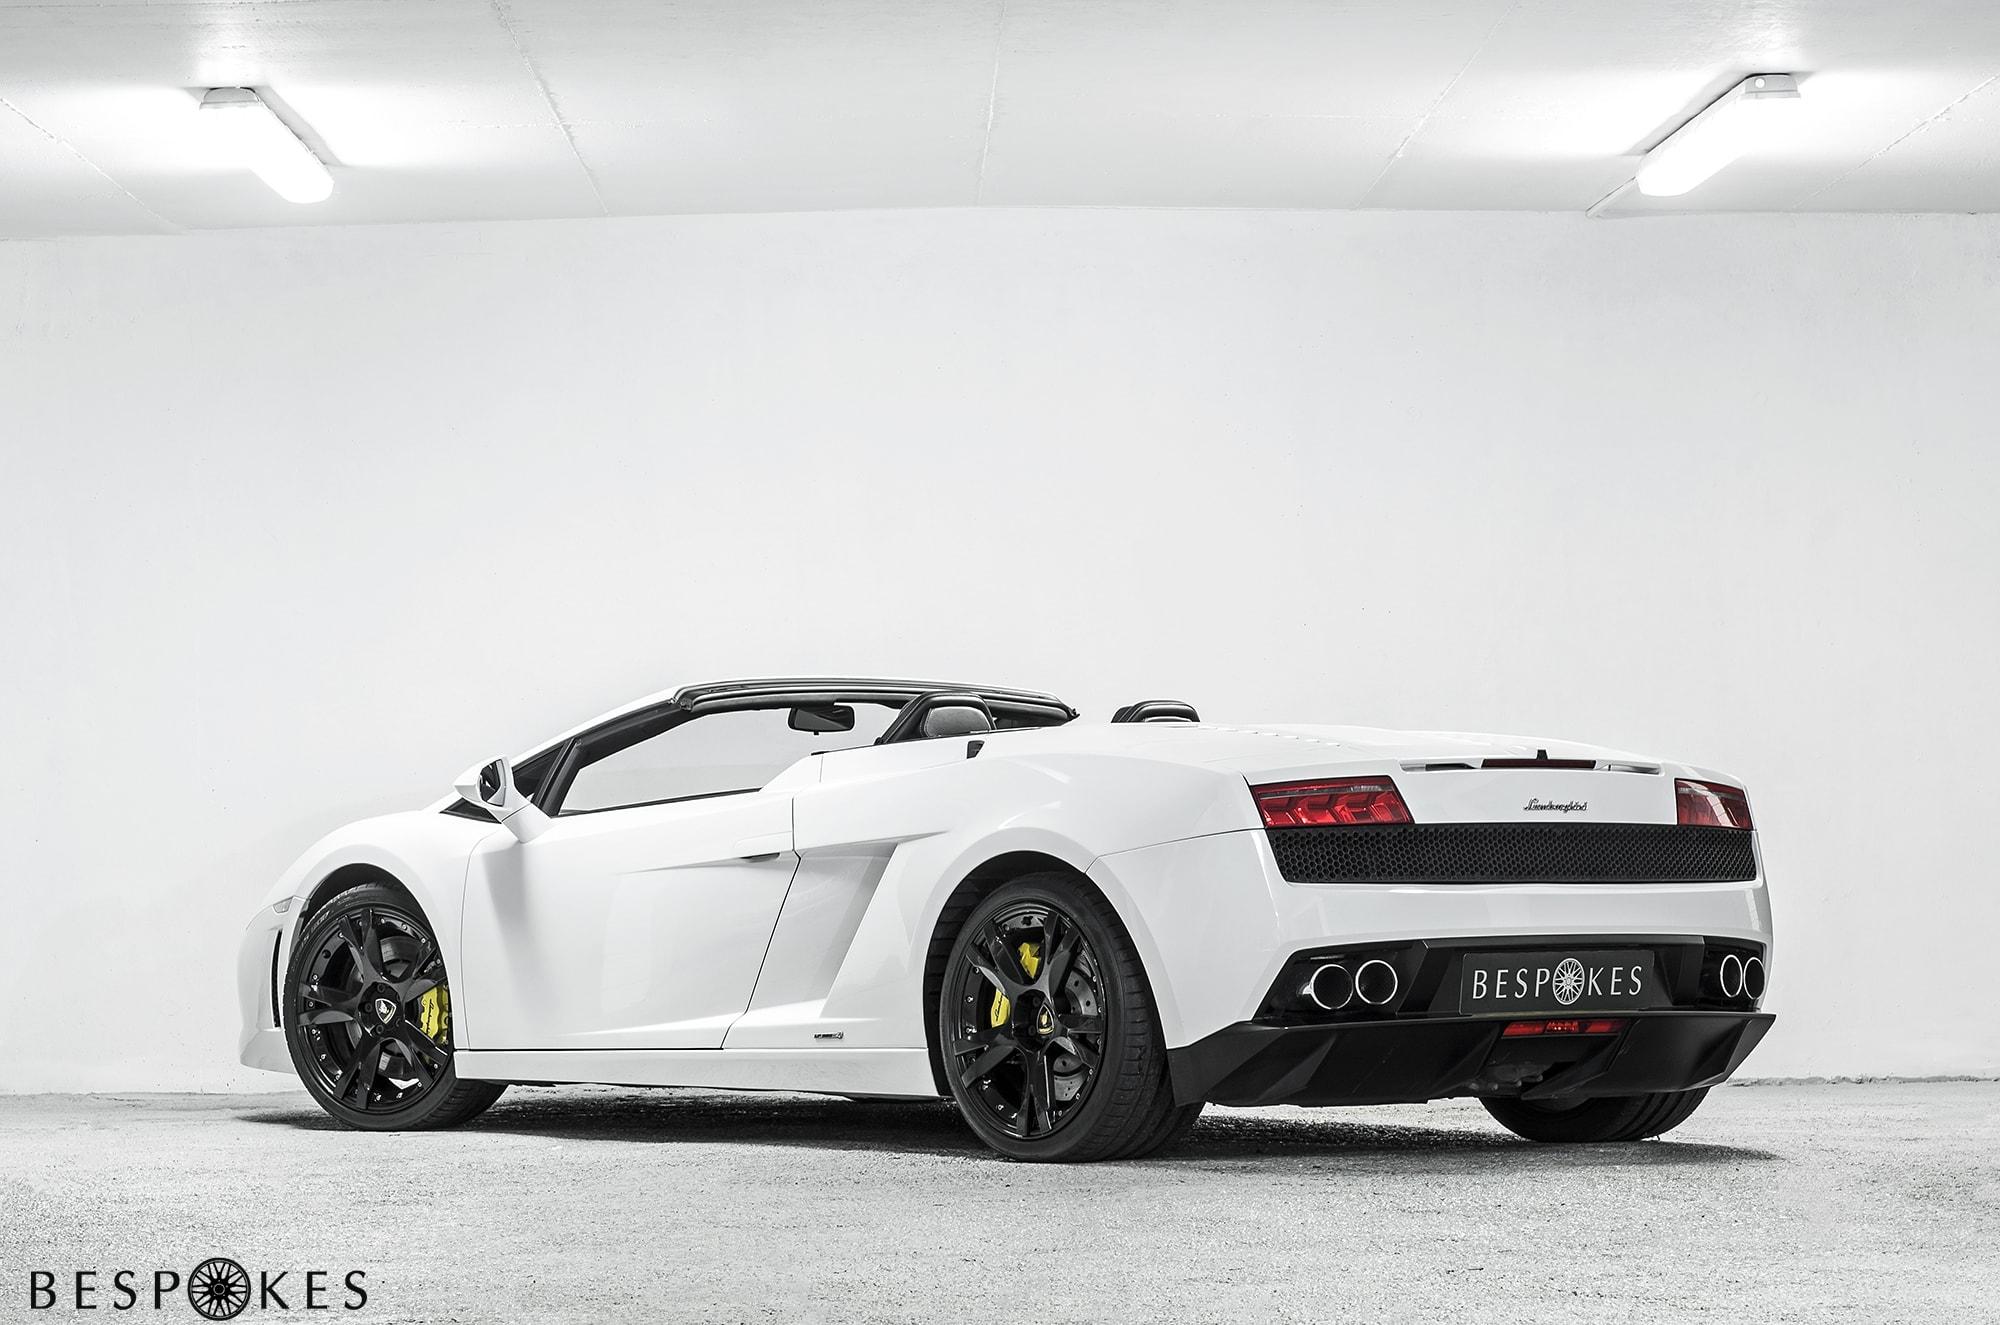 Lamborghini Gallardo Lp560 4 Spyder Bespokes